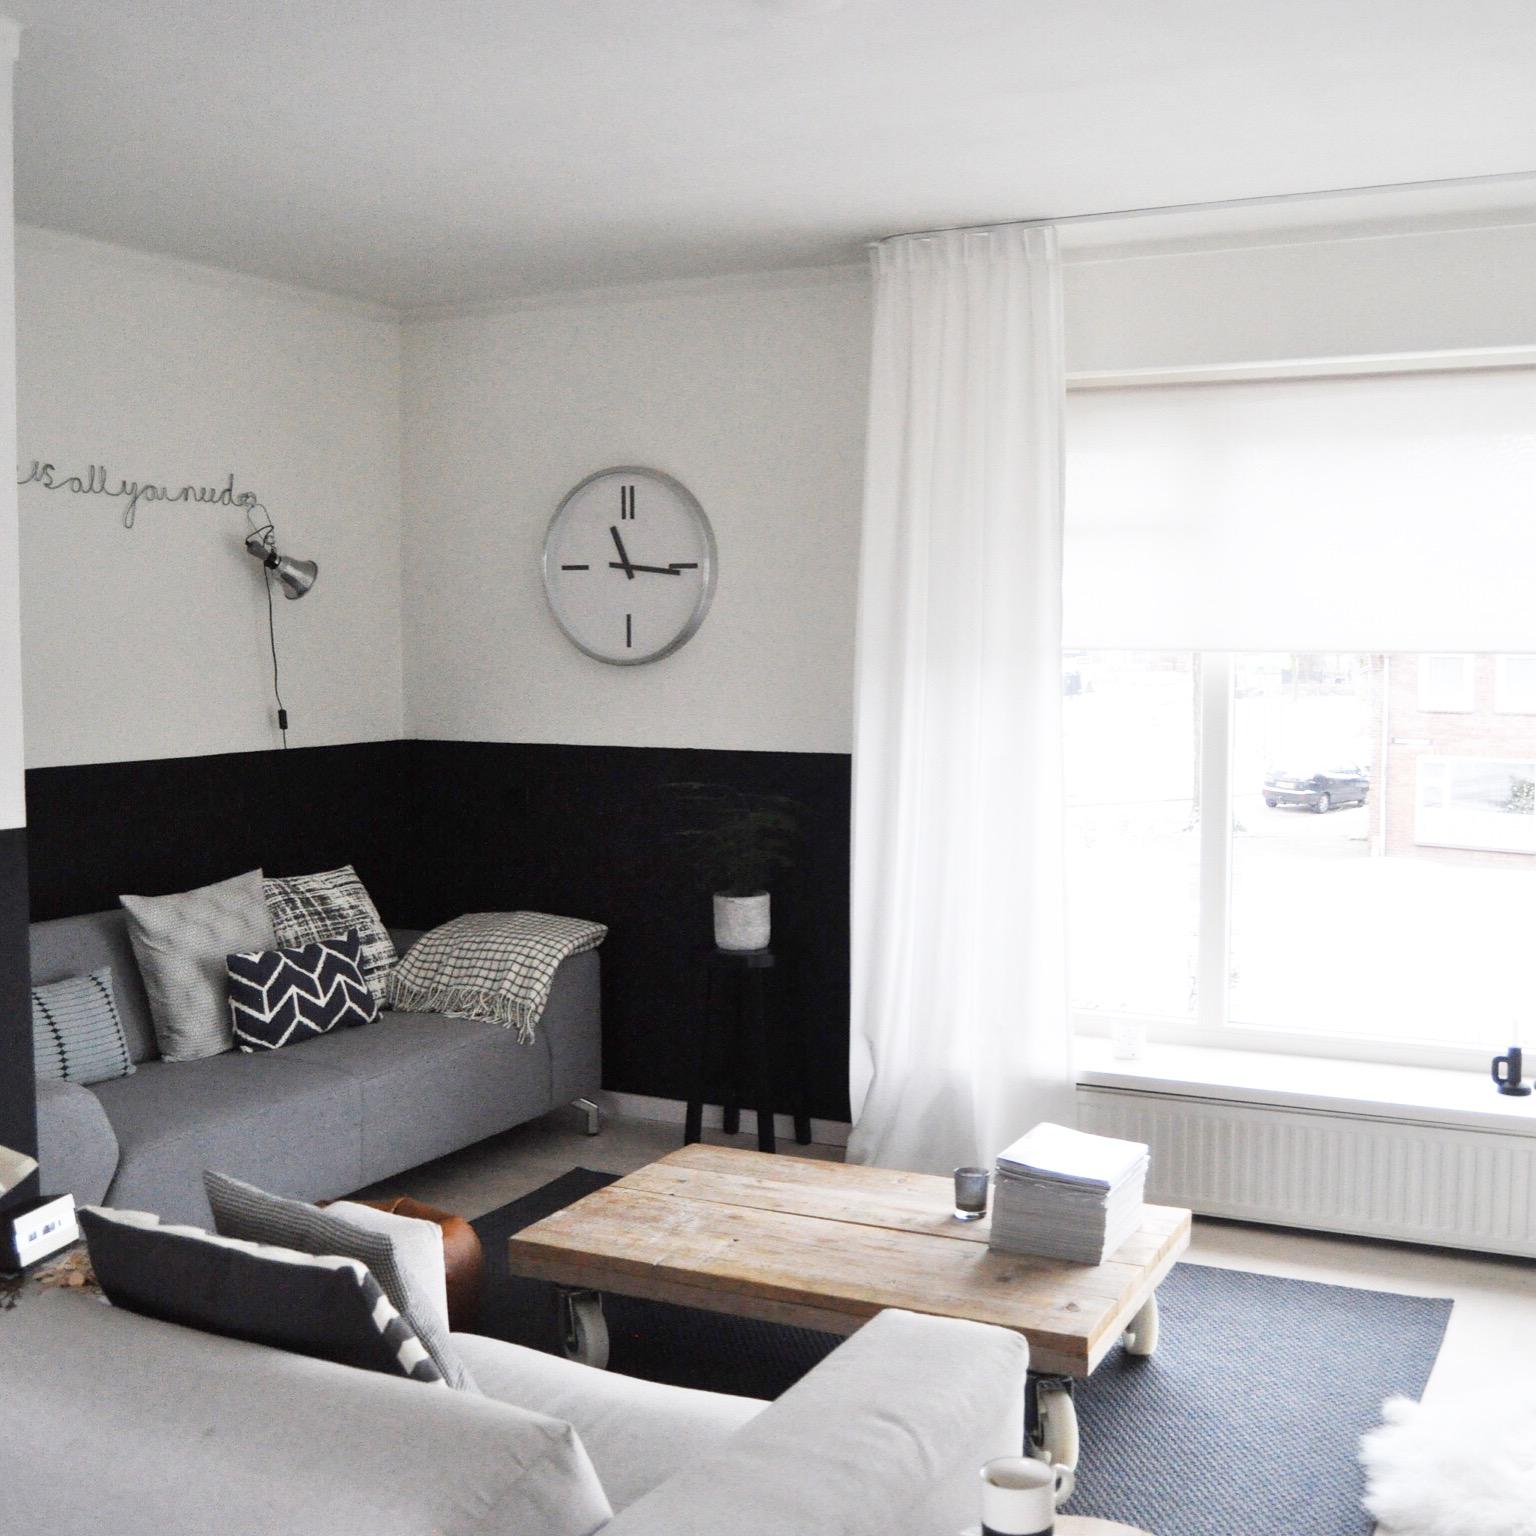 1 bijlage welke muur verven woonkamer 12120 woonkamer for Welke muur verven woonkamer